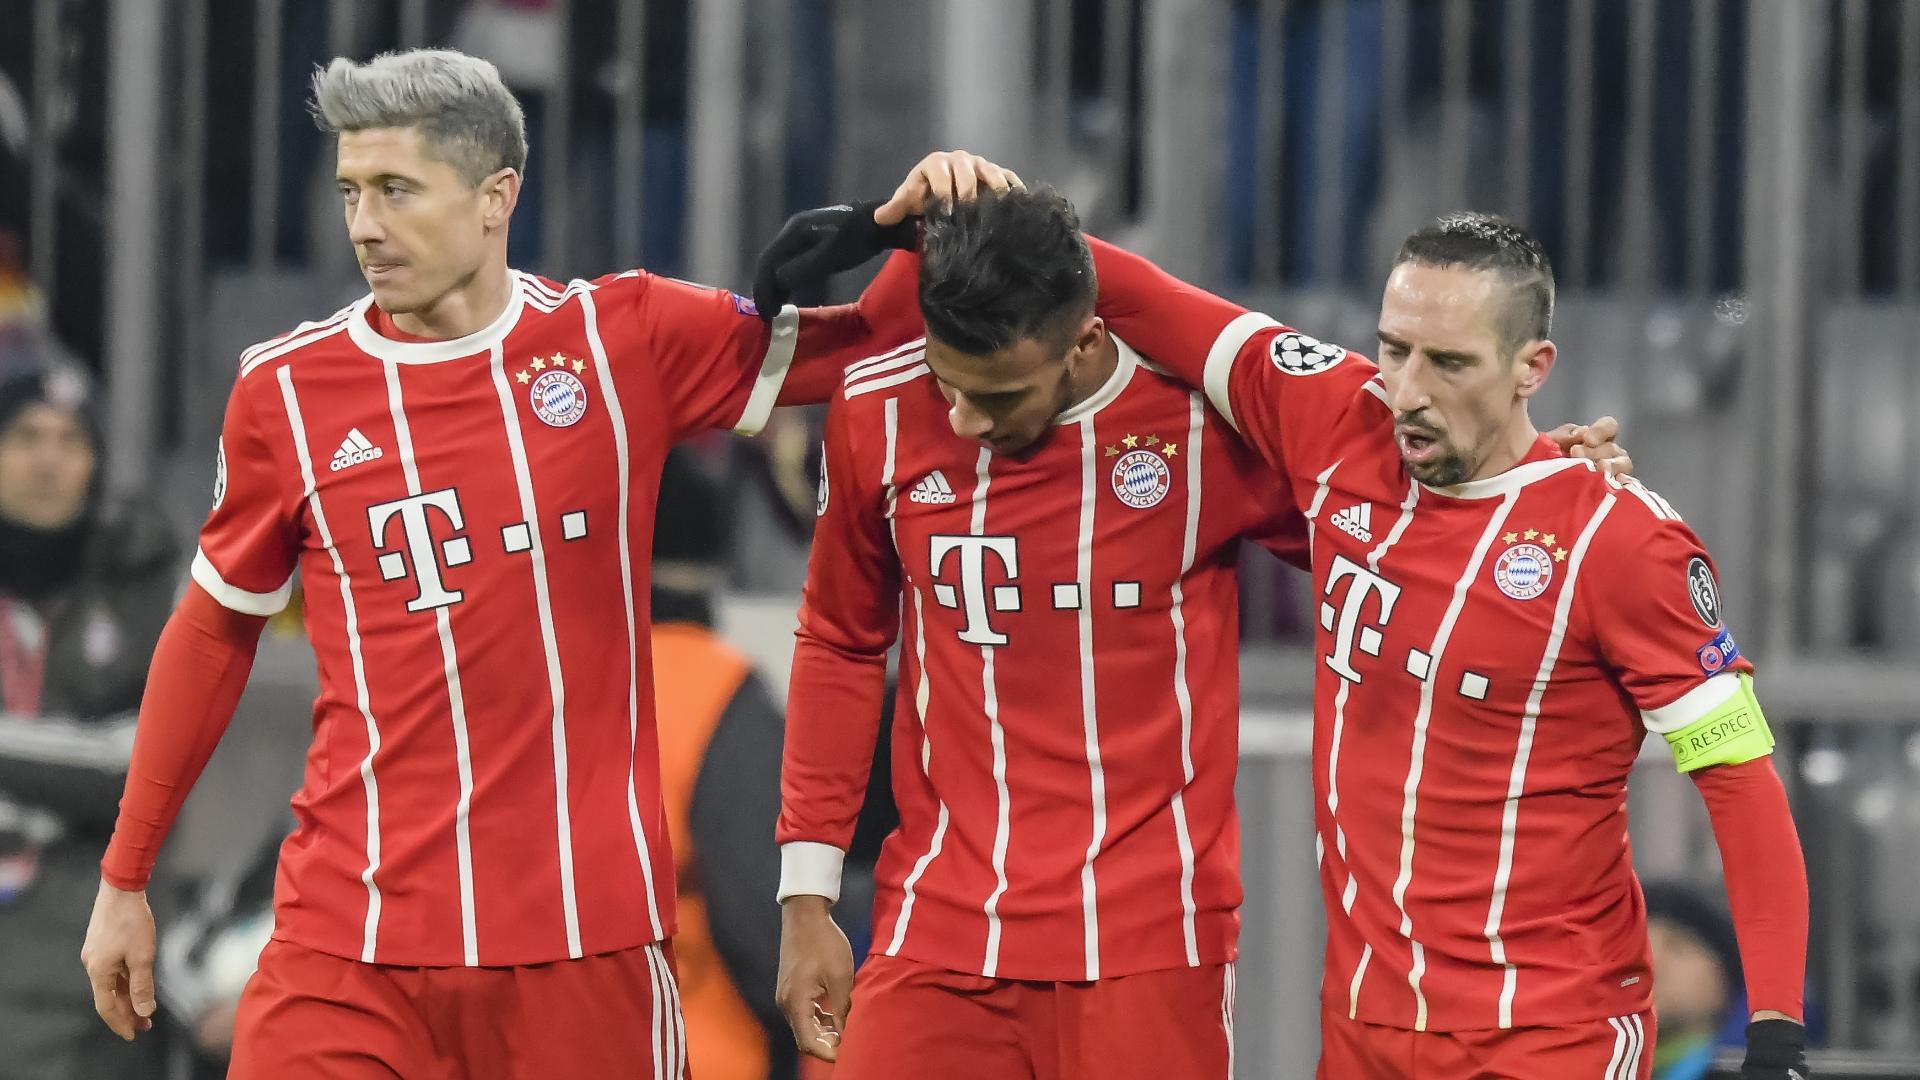 Lewandowski, Tolisso, Ribery, Bayern Munich vs PSG